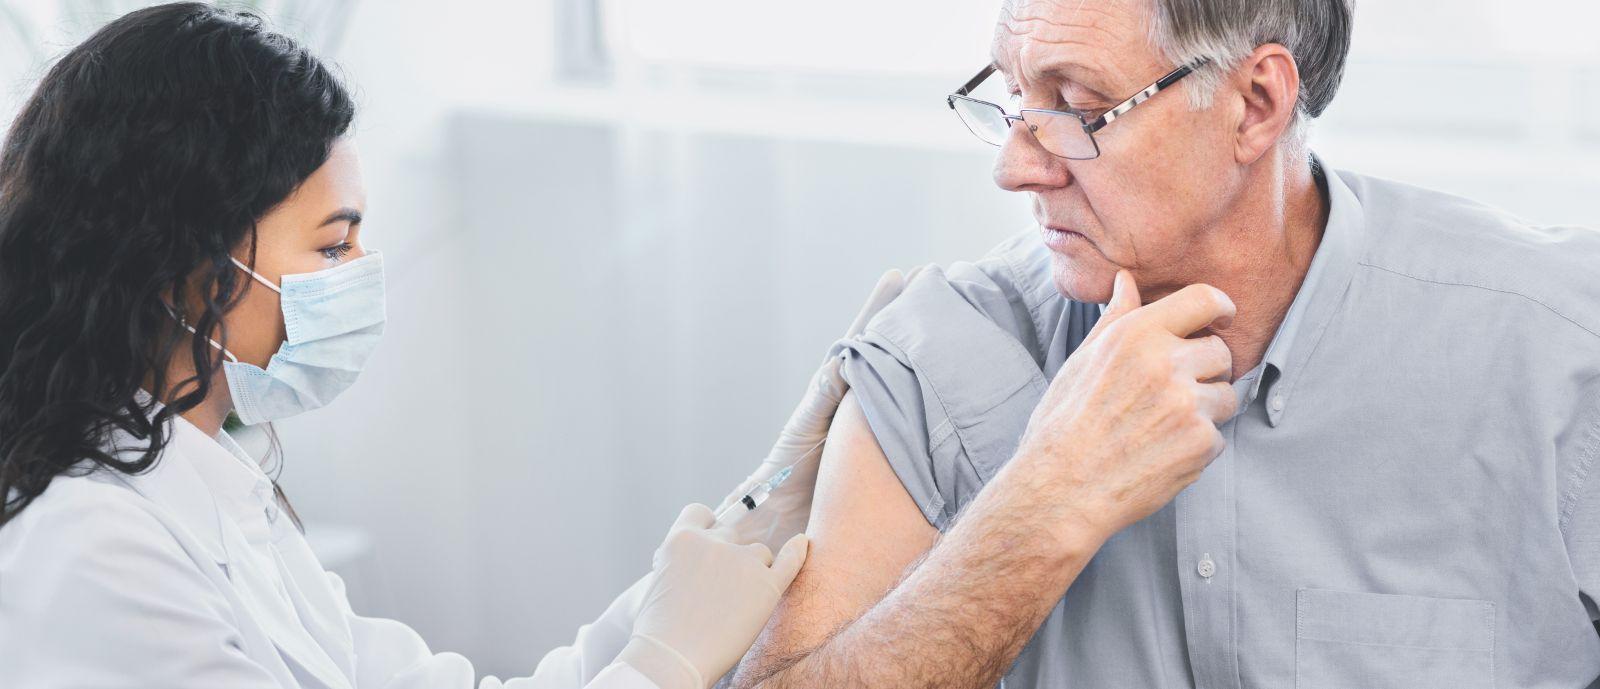 COVID-19 : quid de la vaccination ?